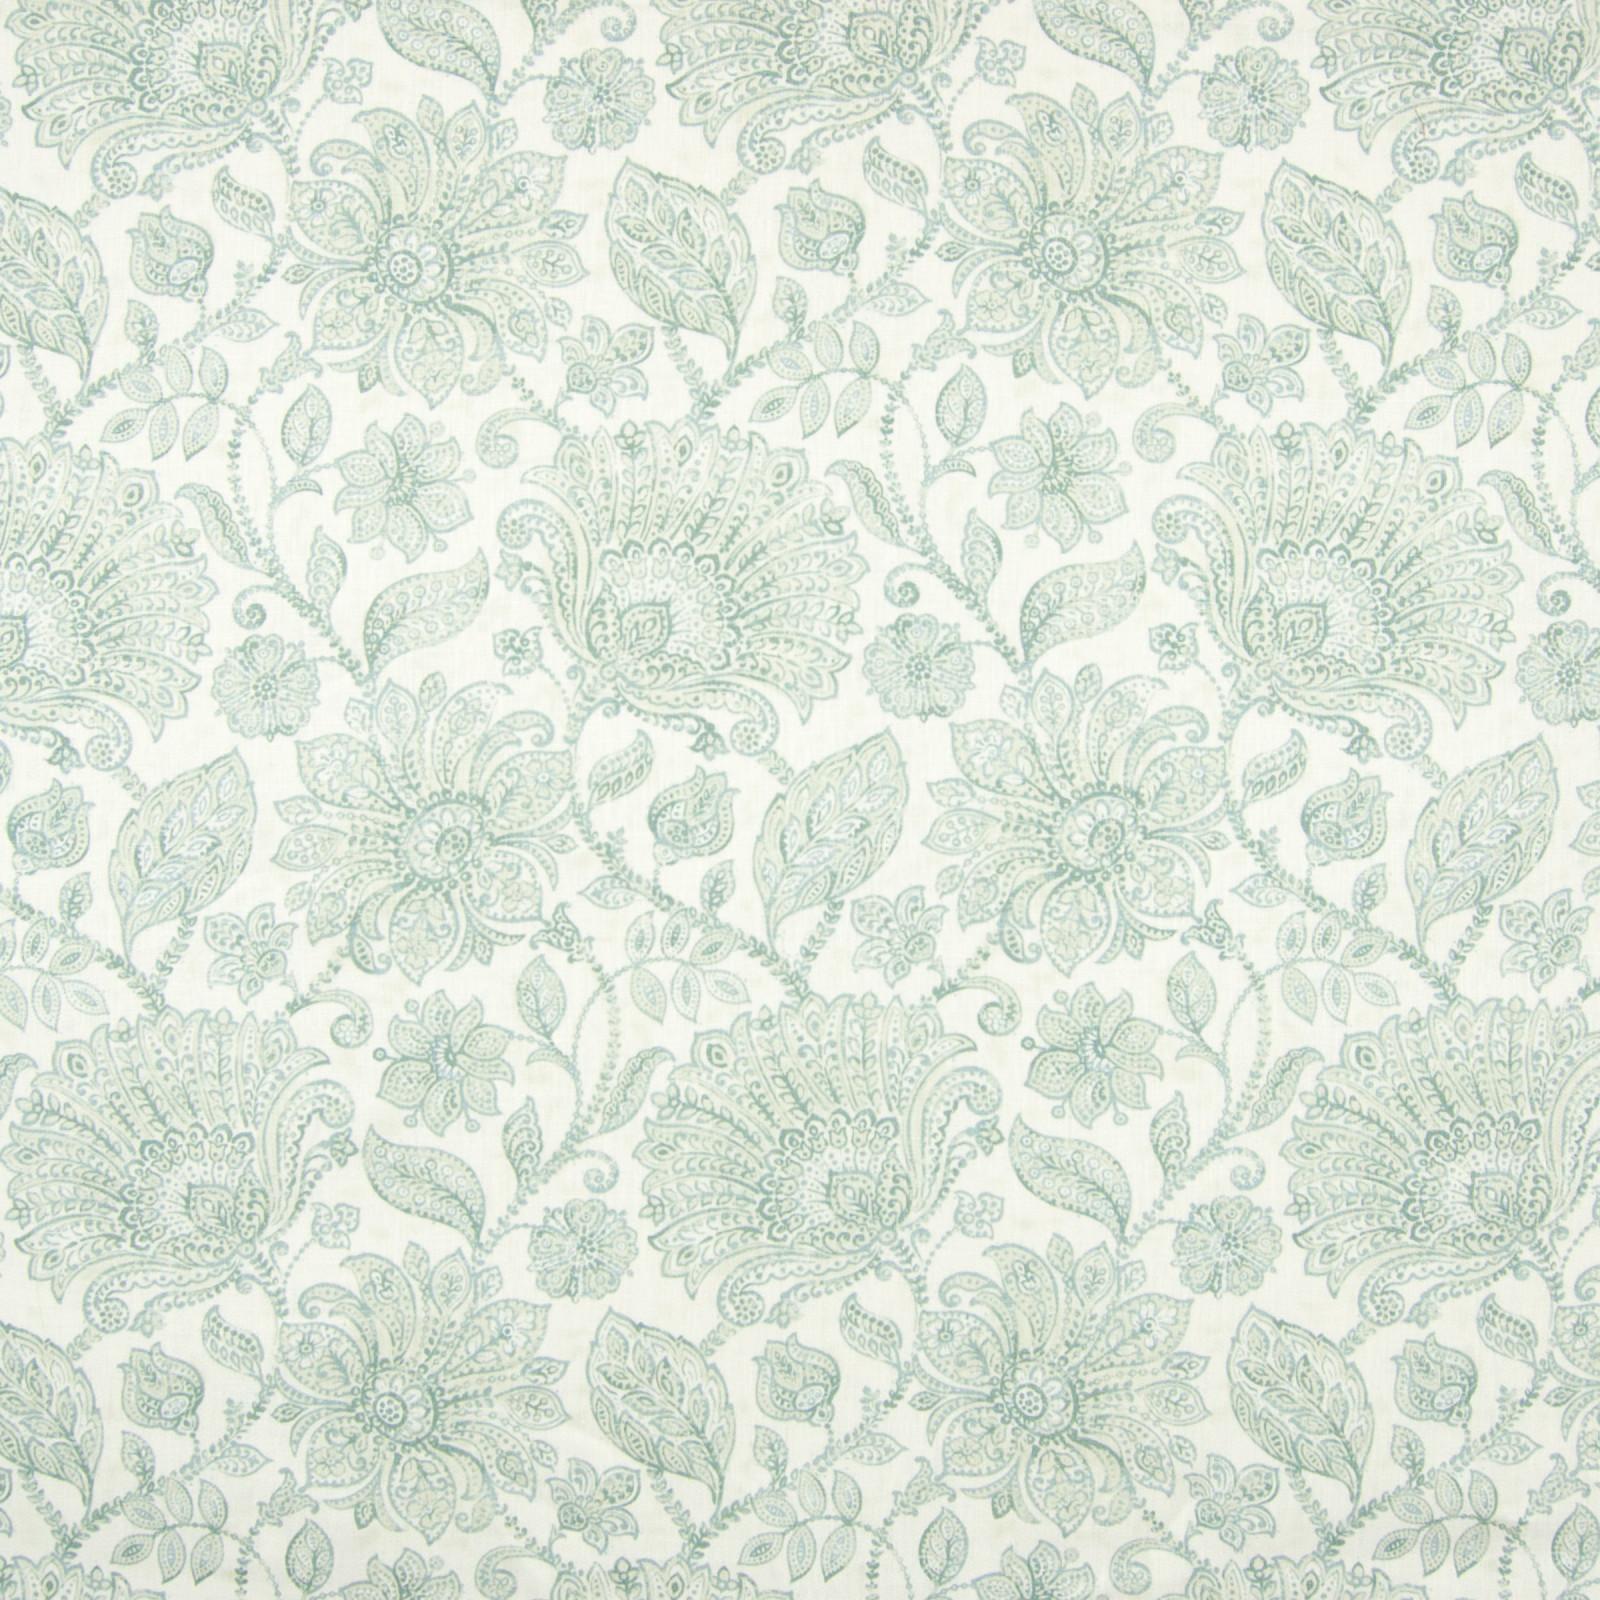 B7362 Spa Greenhouse Fabrics